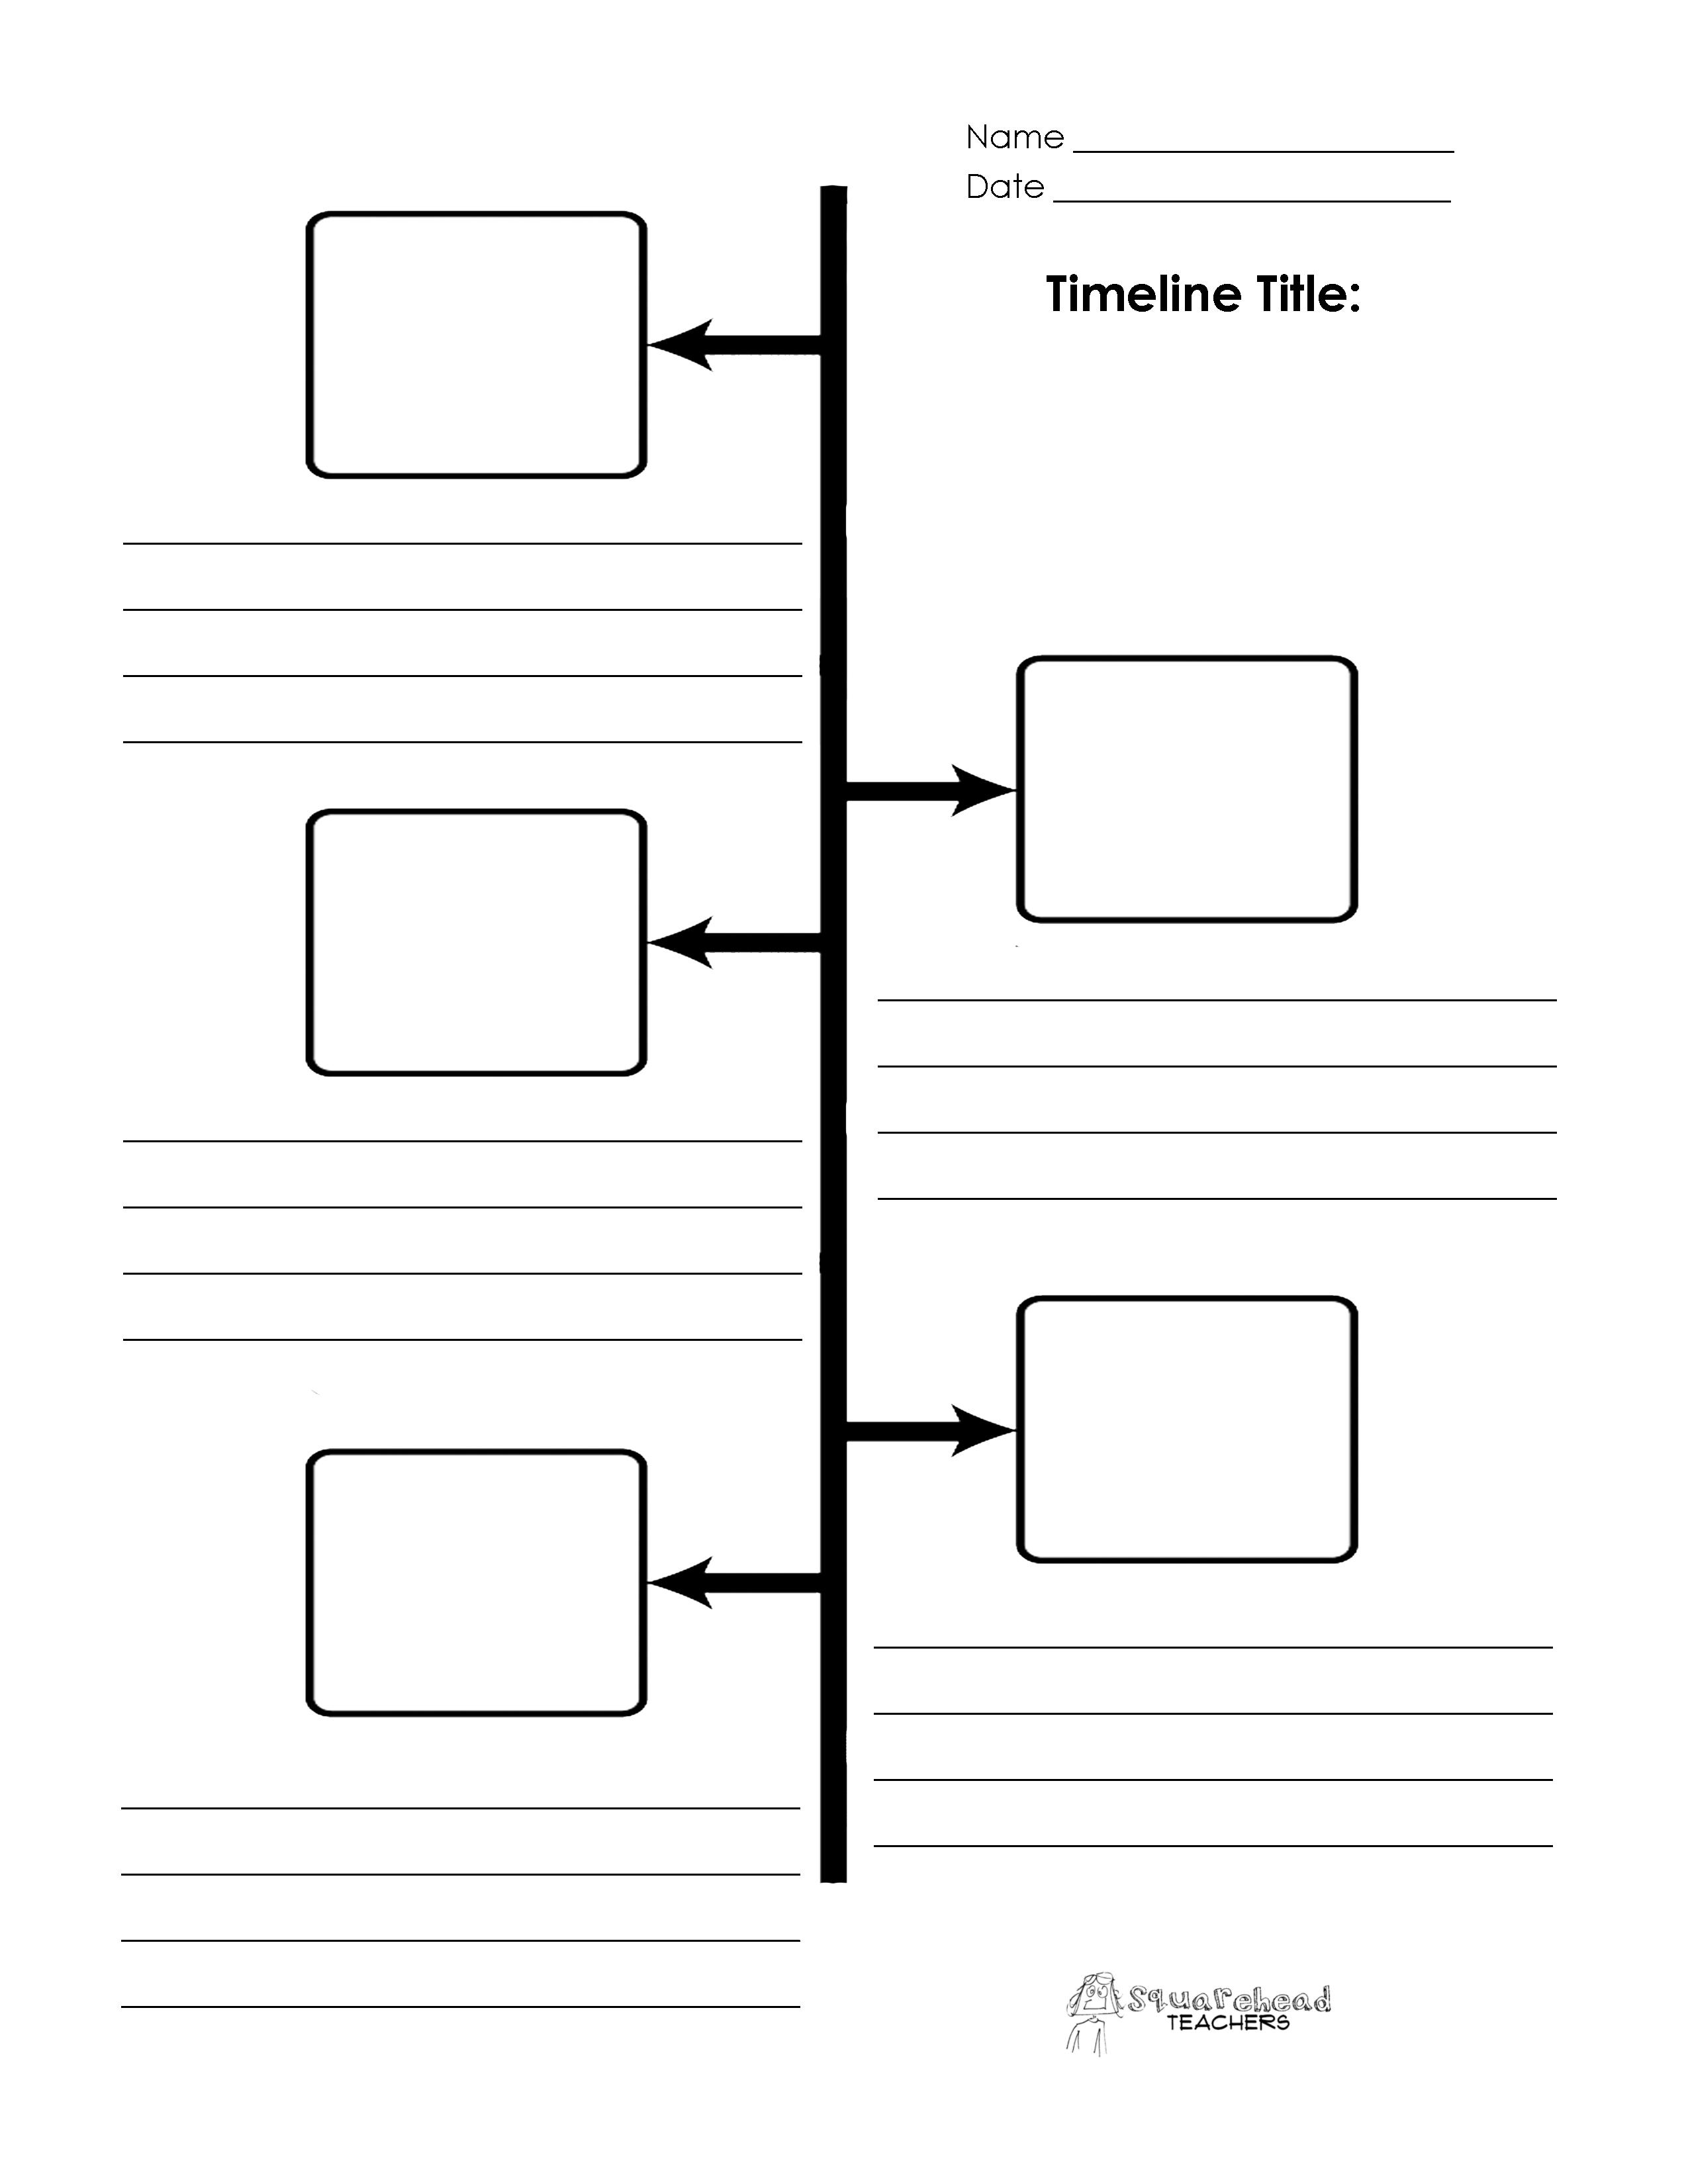 picture regarding Blank Timeline Printable identified as Blank Timeline Printables Squarehead Lecturers